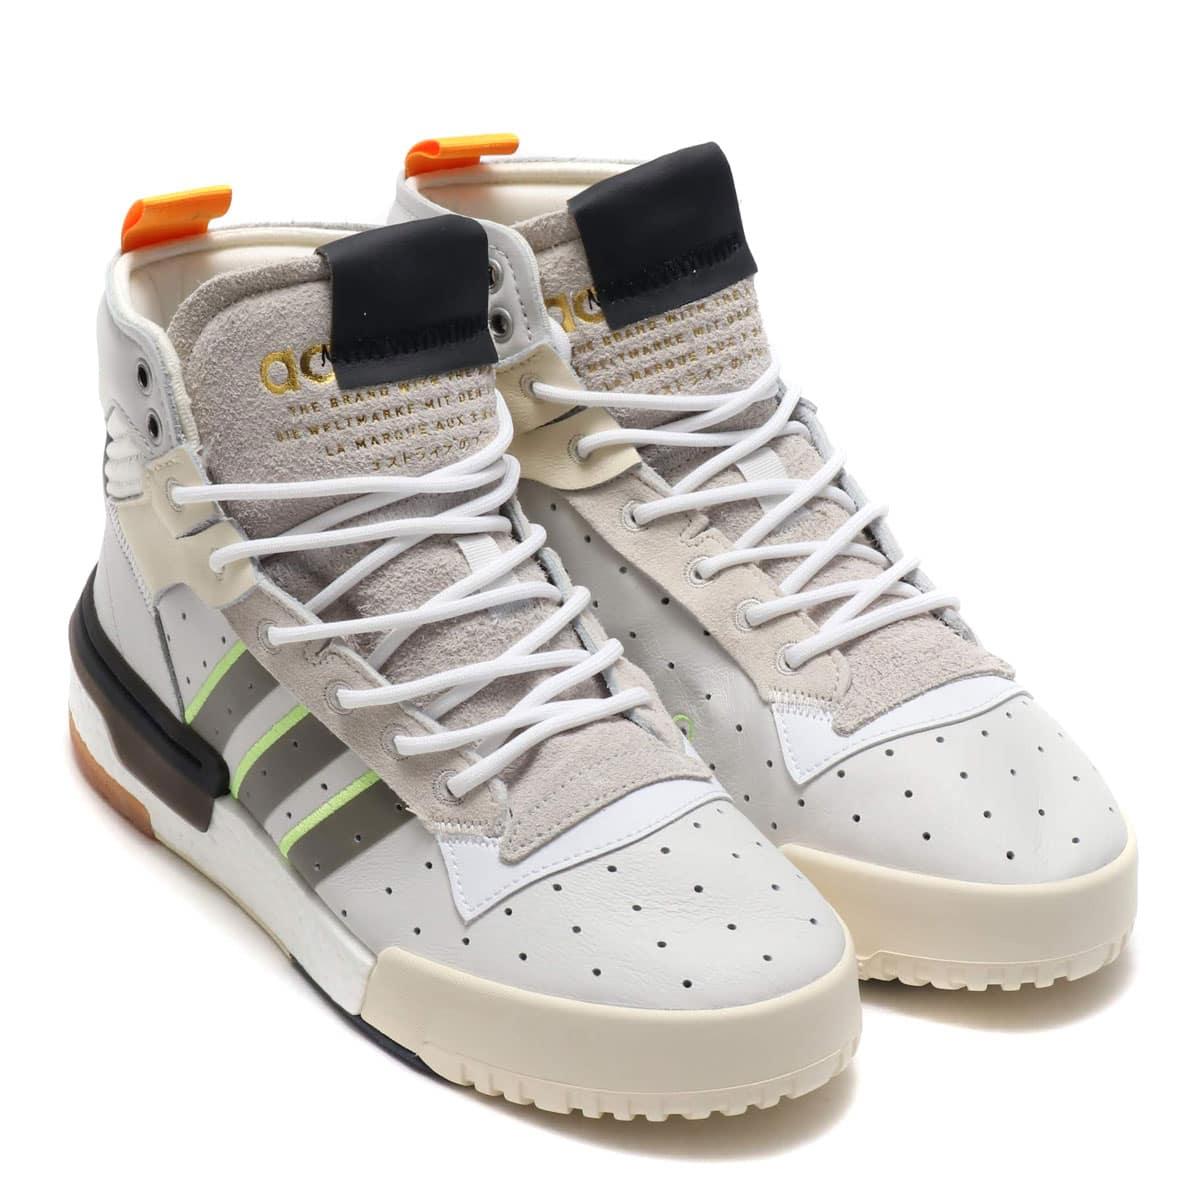 adidas Originals RIVLRY RM CRYSTAL WHITE/RUNNING WHITE/CREAM WHITE 19SS-I_photo_large